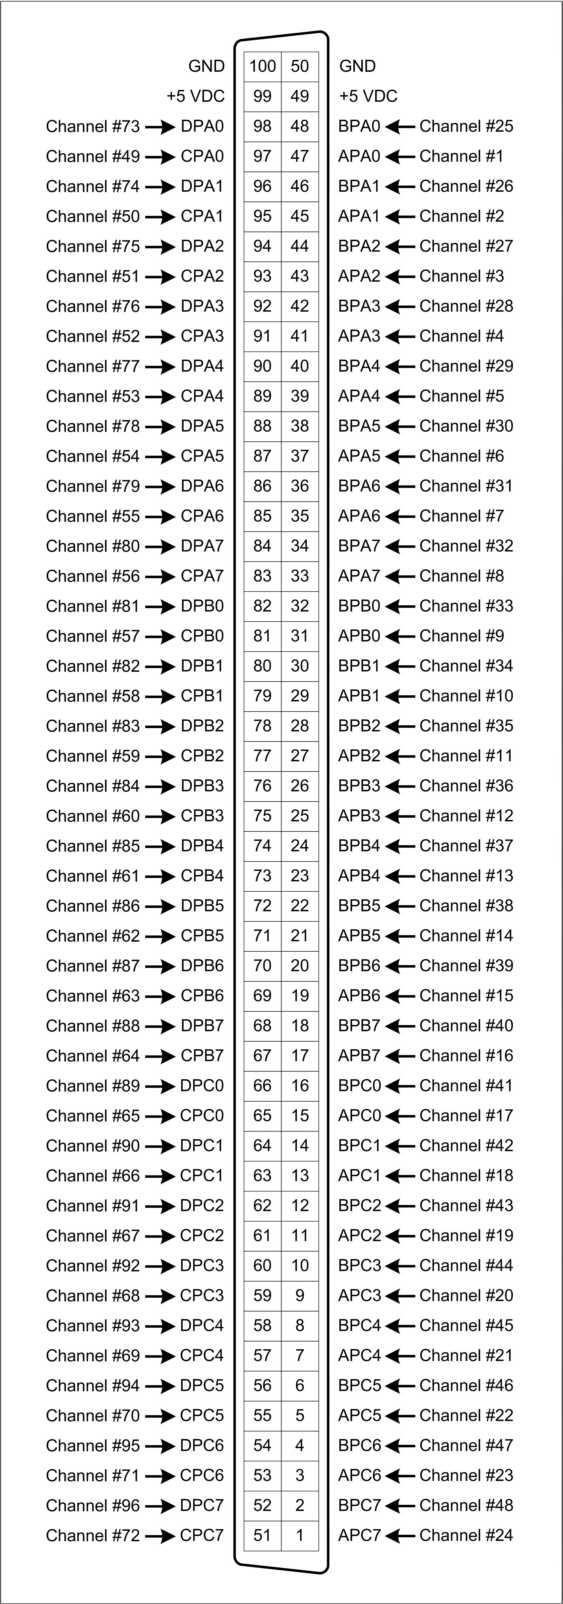 PCI DIO 96_Pinout file pci dio 96 pinout jpg doityourselfchristmas com pci pinout diagram at reclaimingppi.co